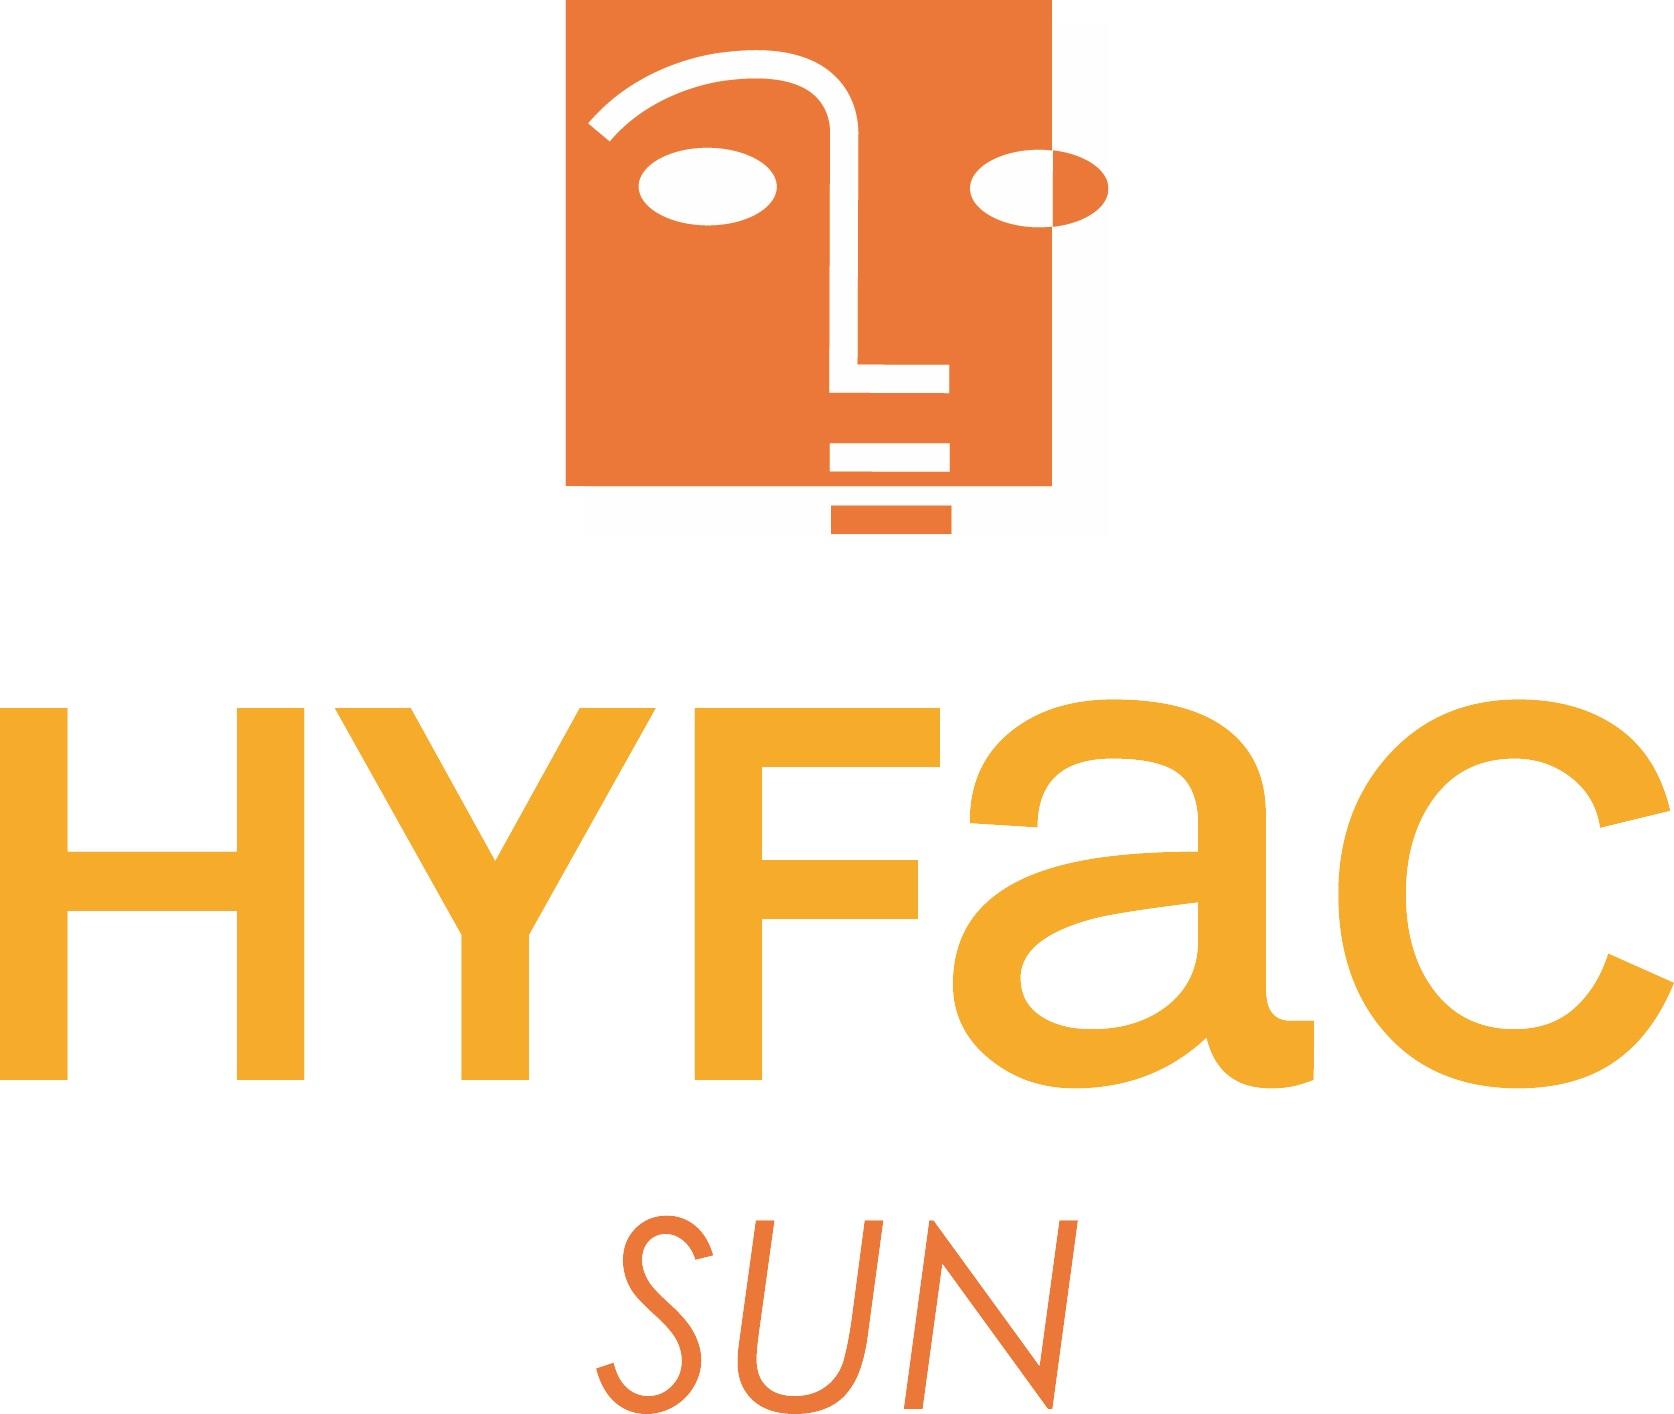 logo hyfac sun